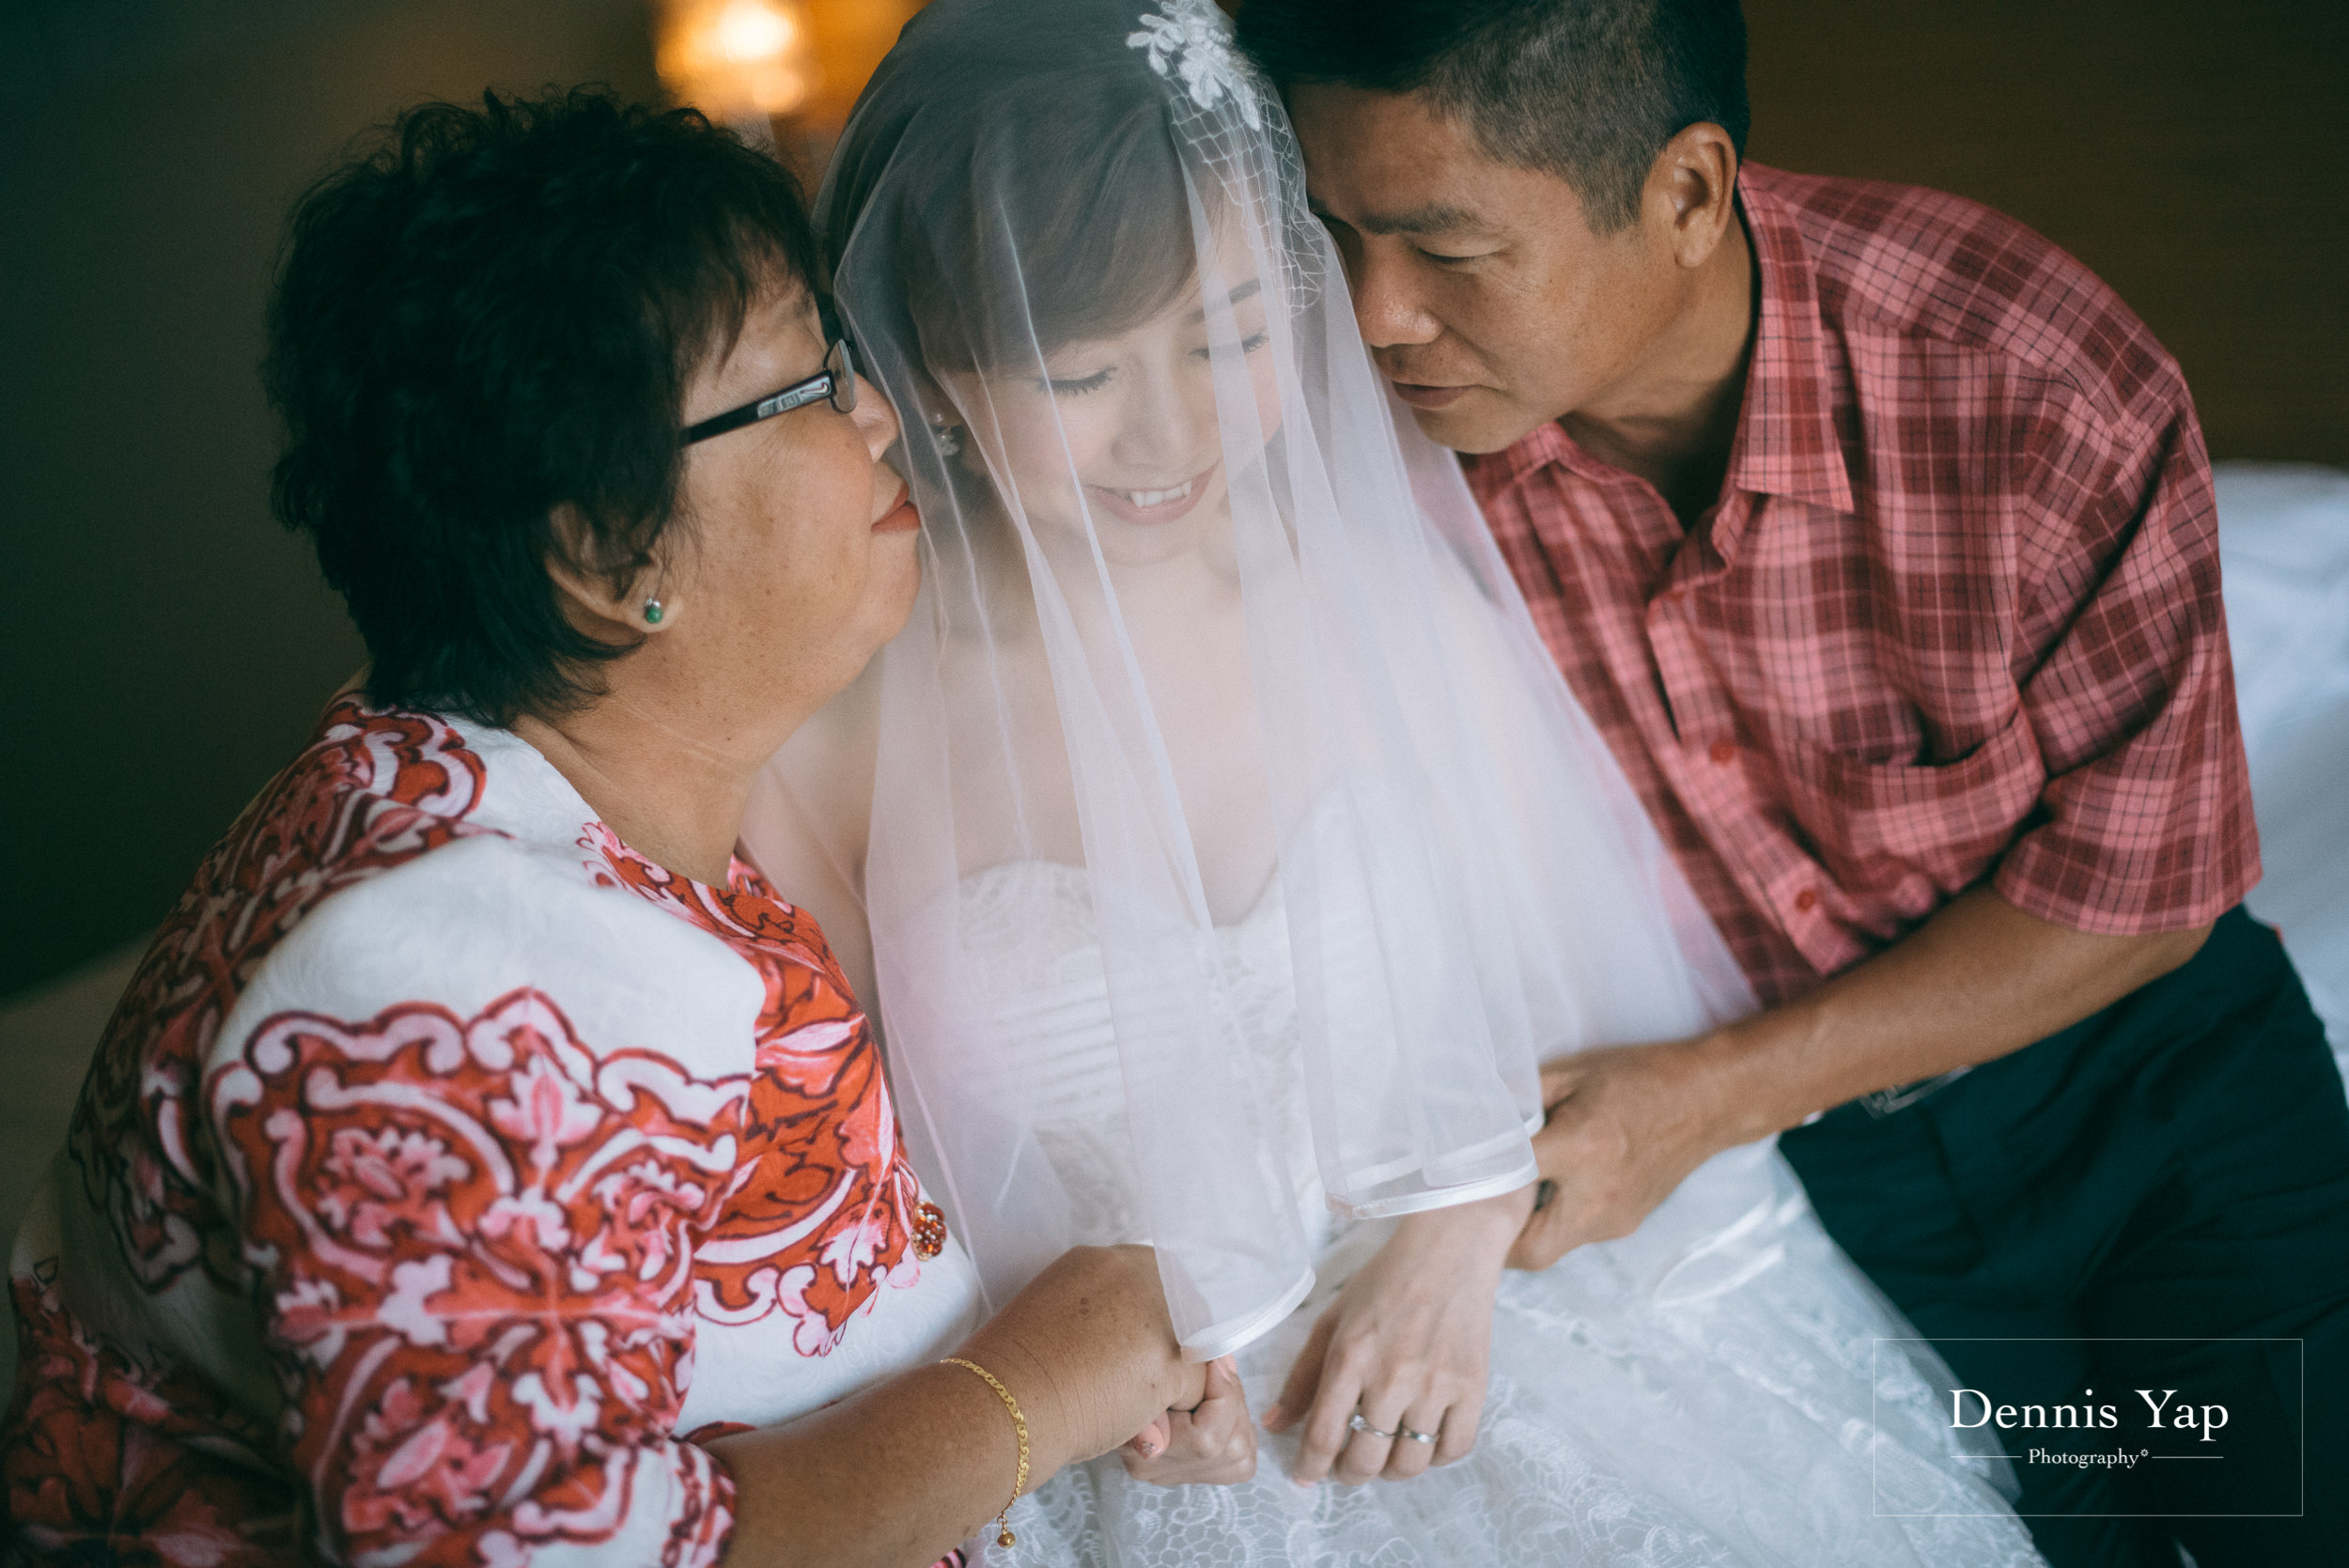 alex eivan wedding day kuala lumpur malaysia dennis yap photography short gown-6.jpg